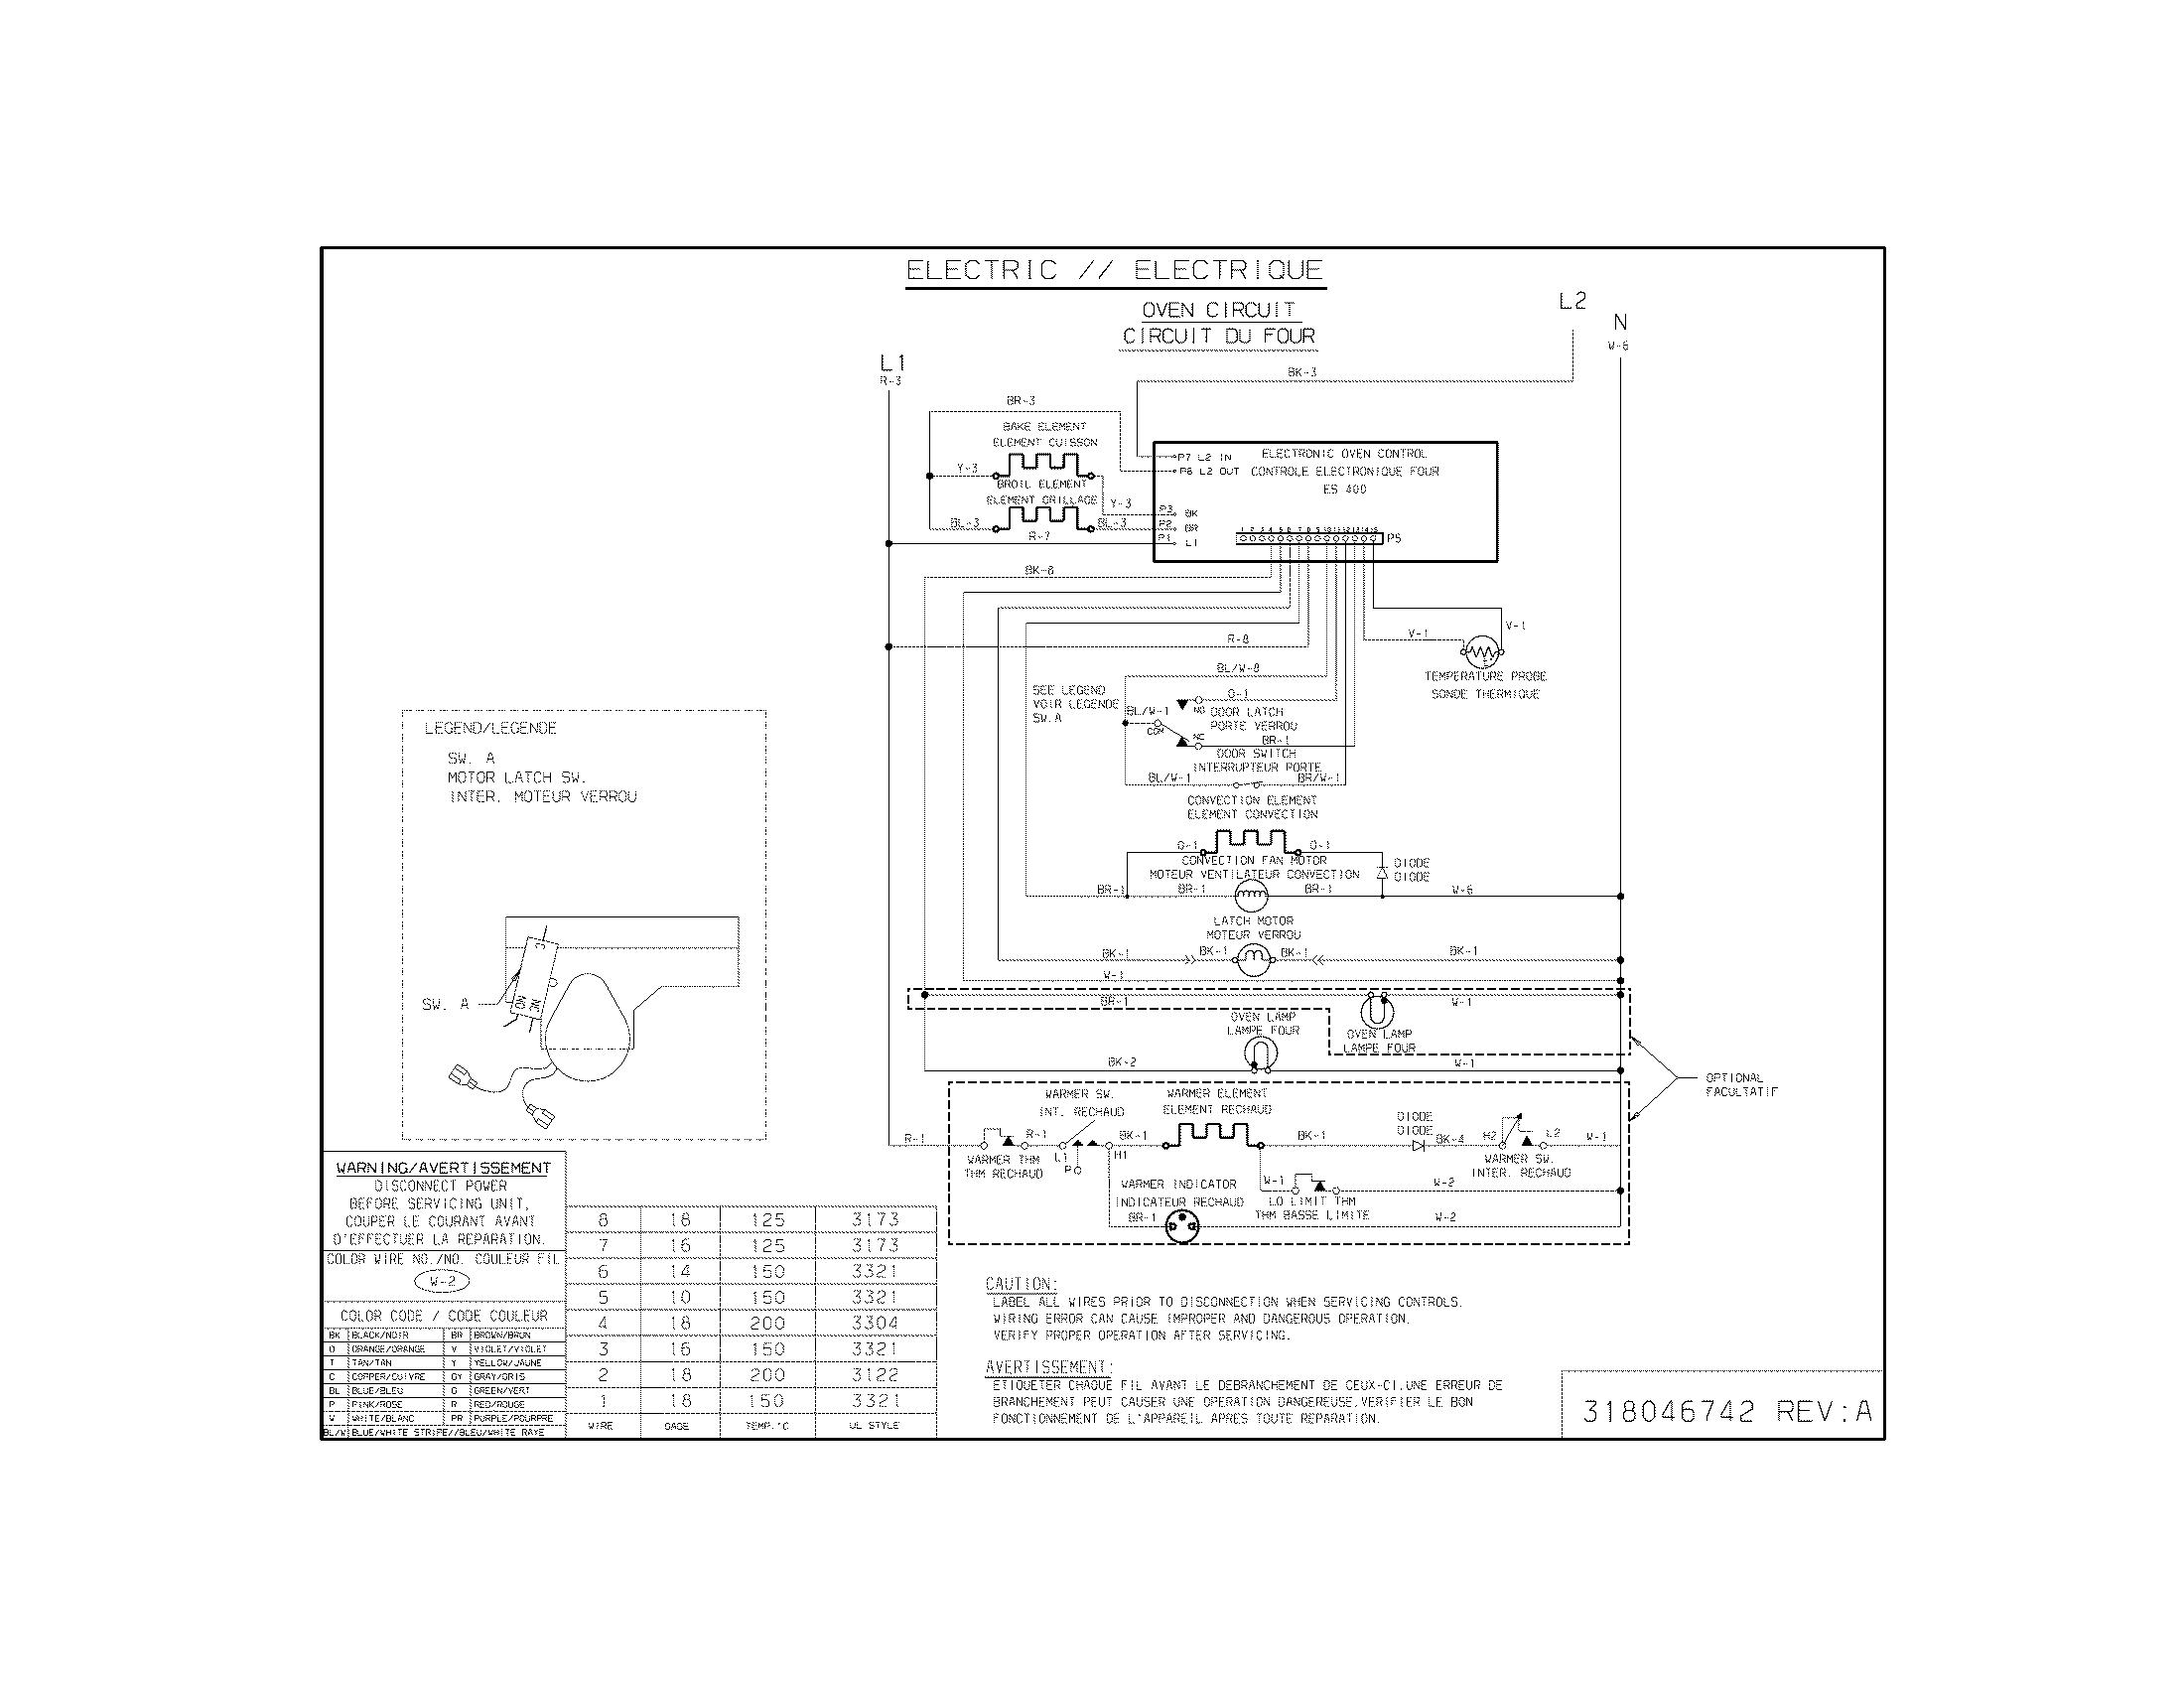 Electrolux Microwave Wiring Diagram - Wiring Diagram